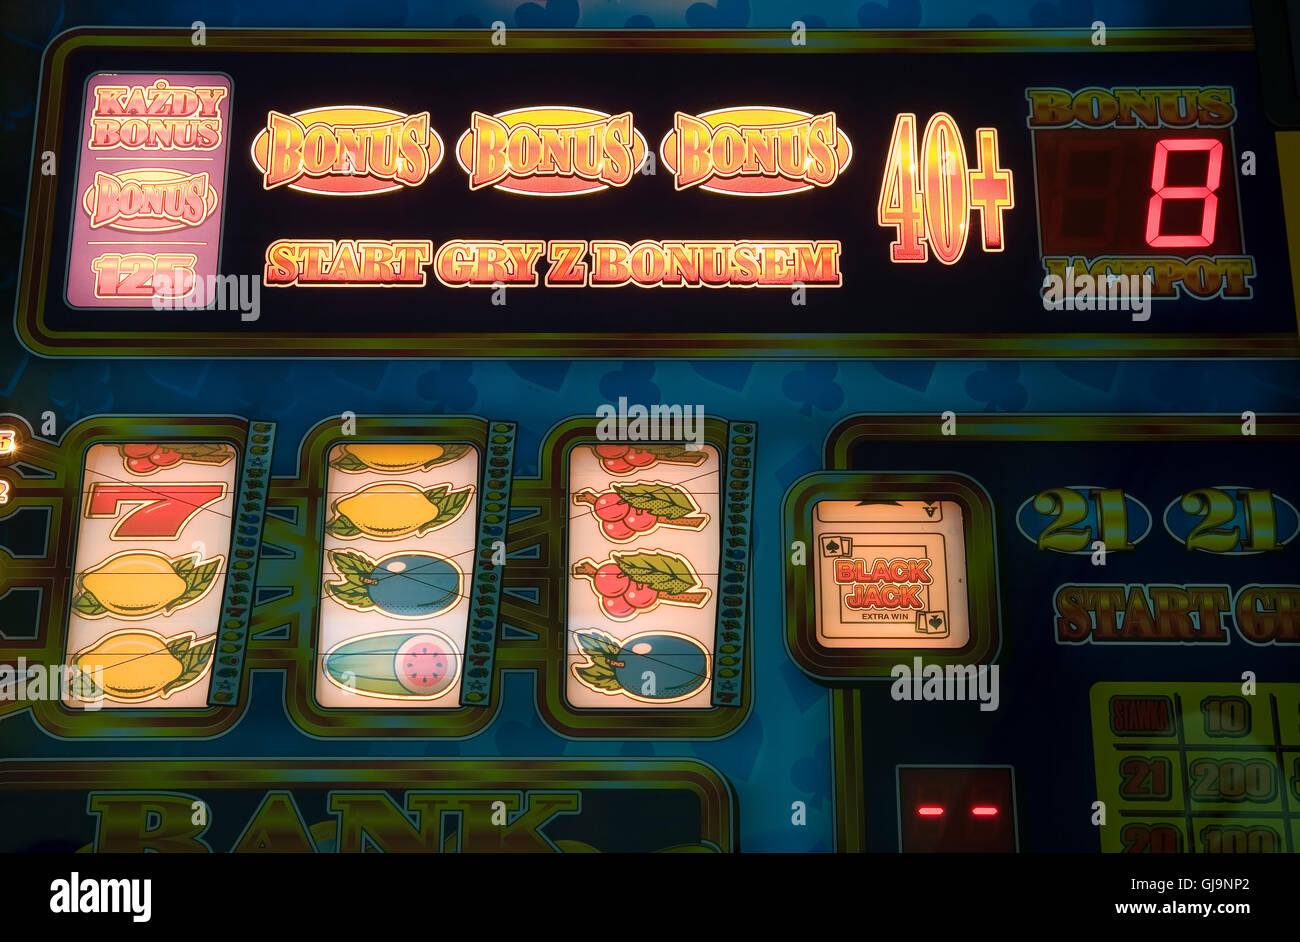 let's gamble - Stock Image